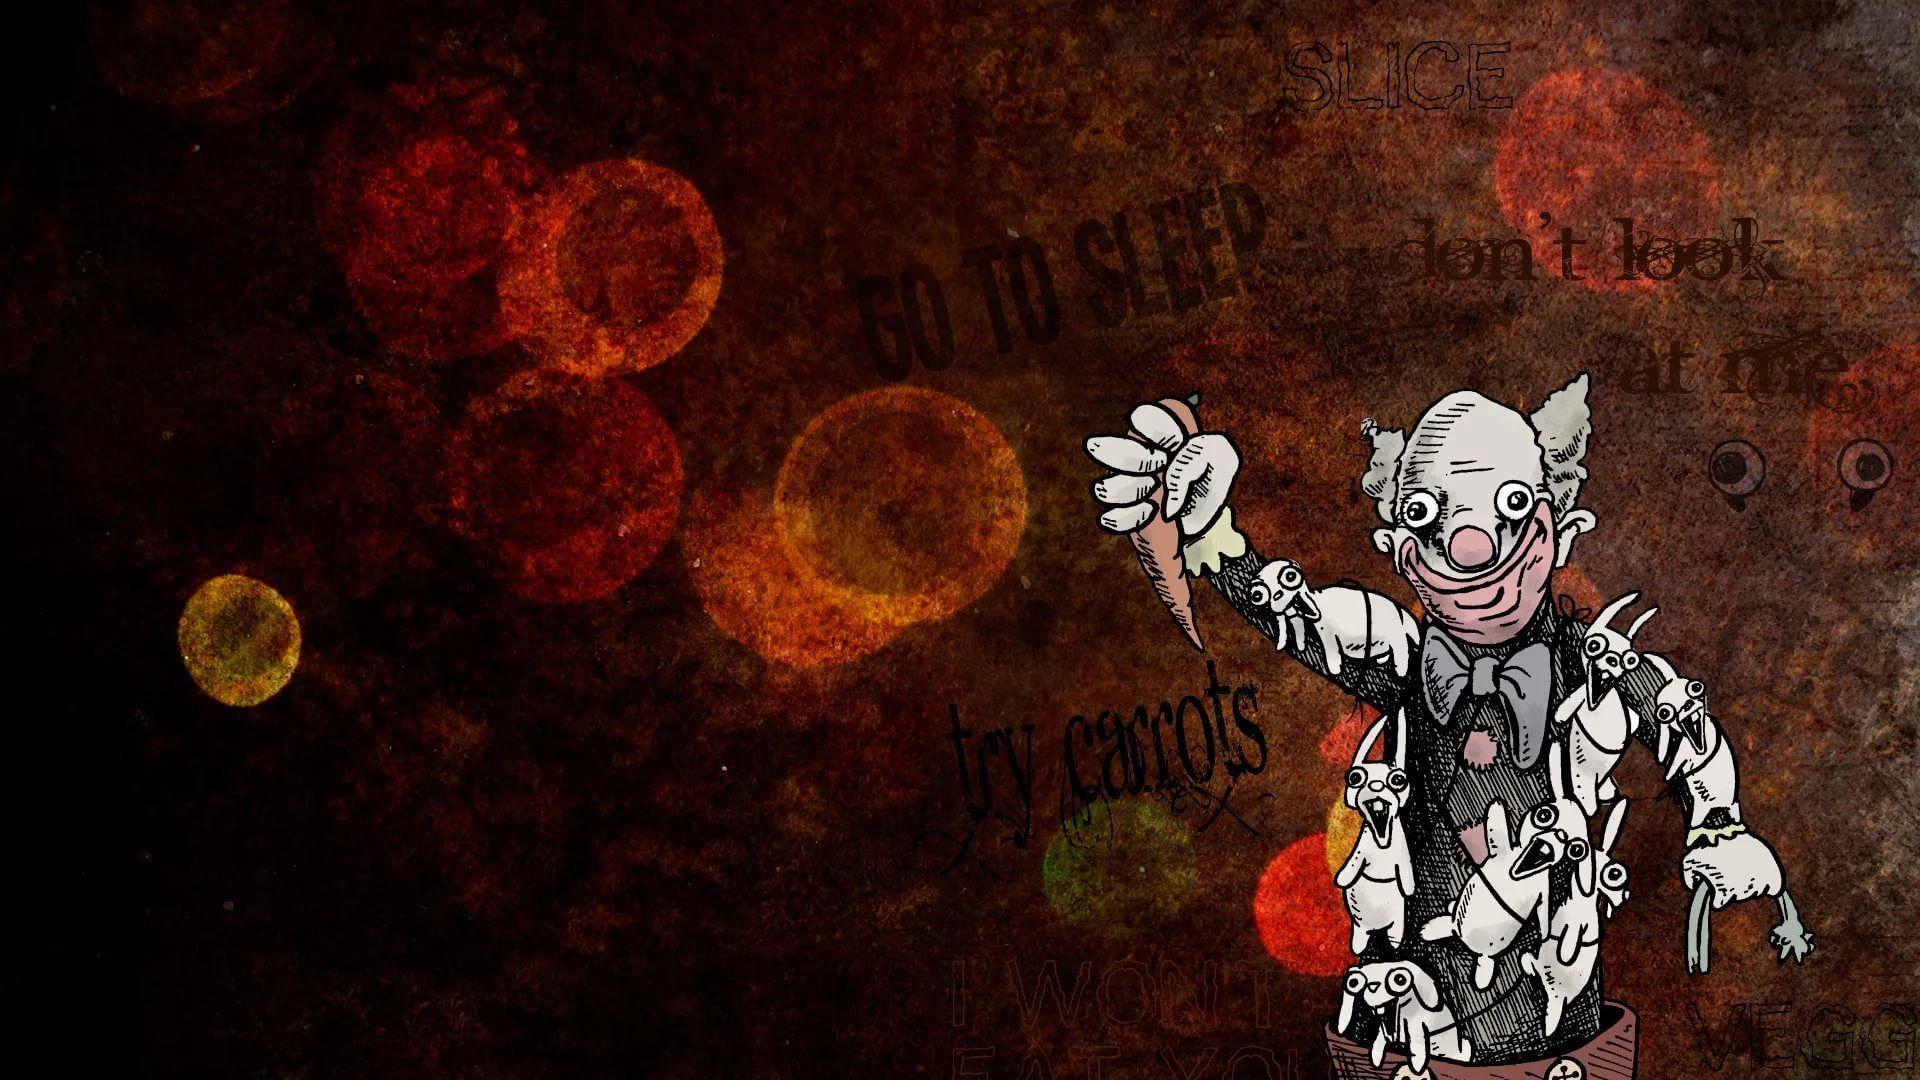 Killer Clown free hd wallpaper